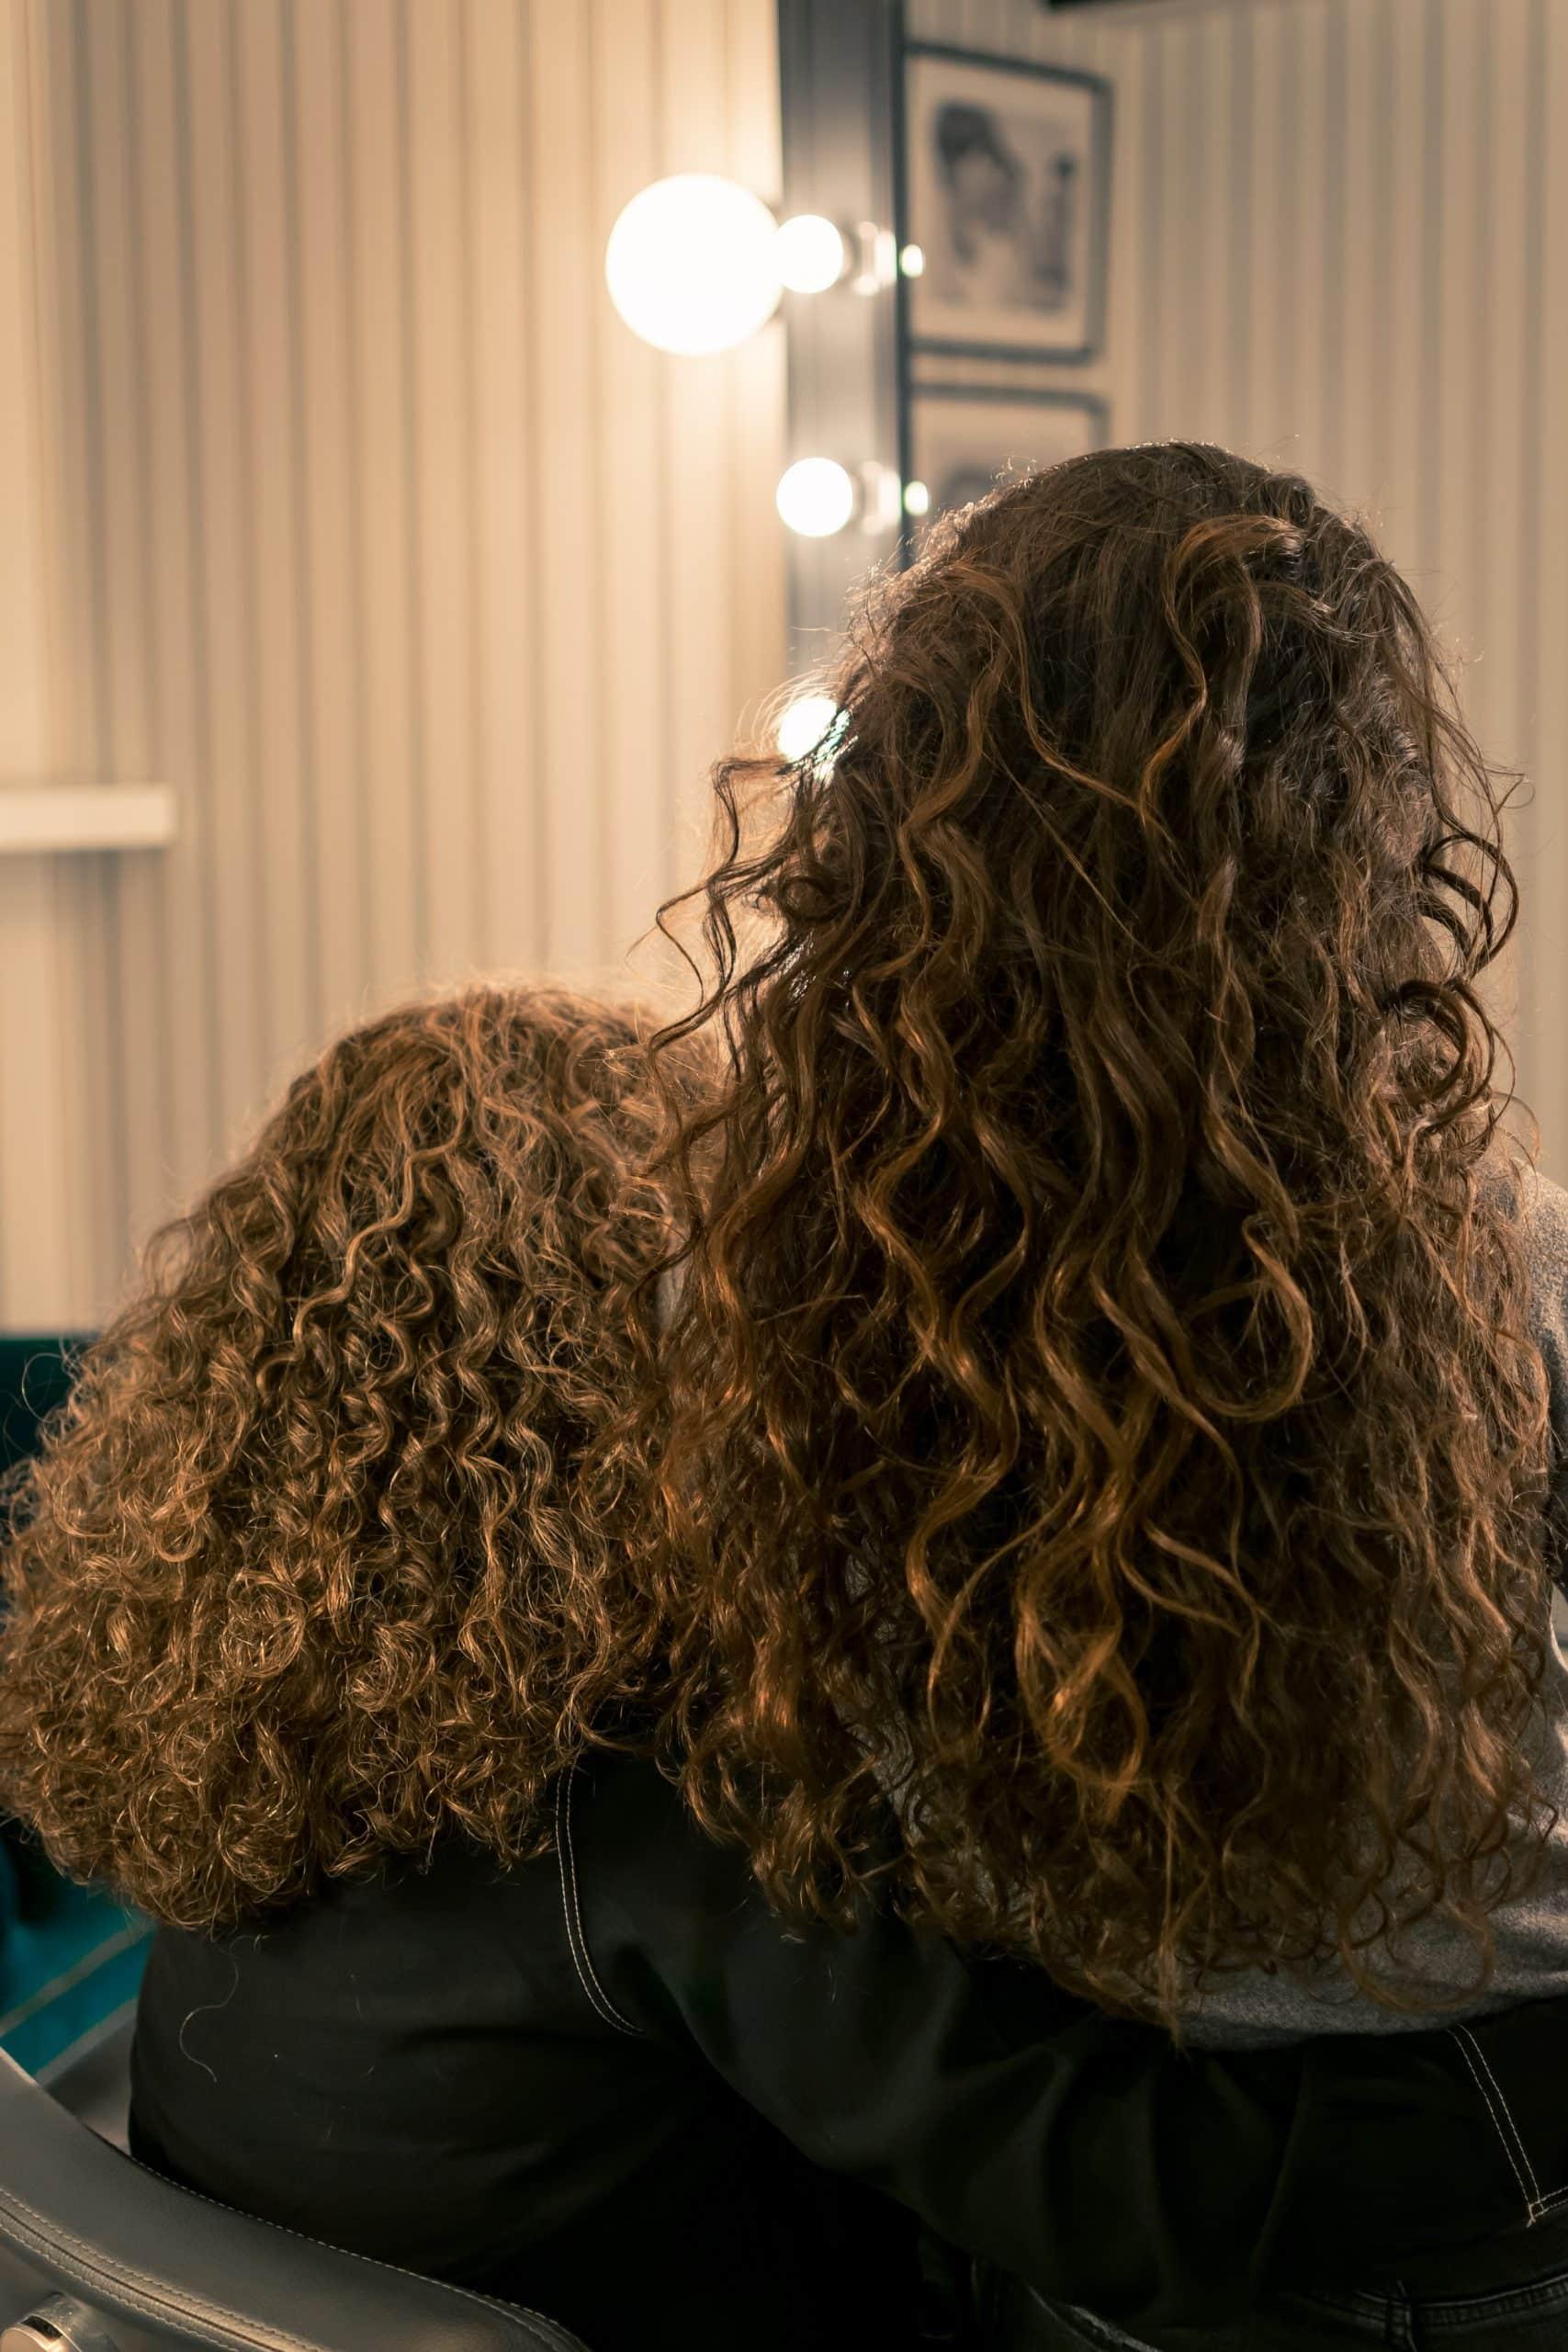 cabello rizado IN Viso 5 scaled